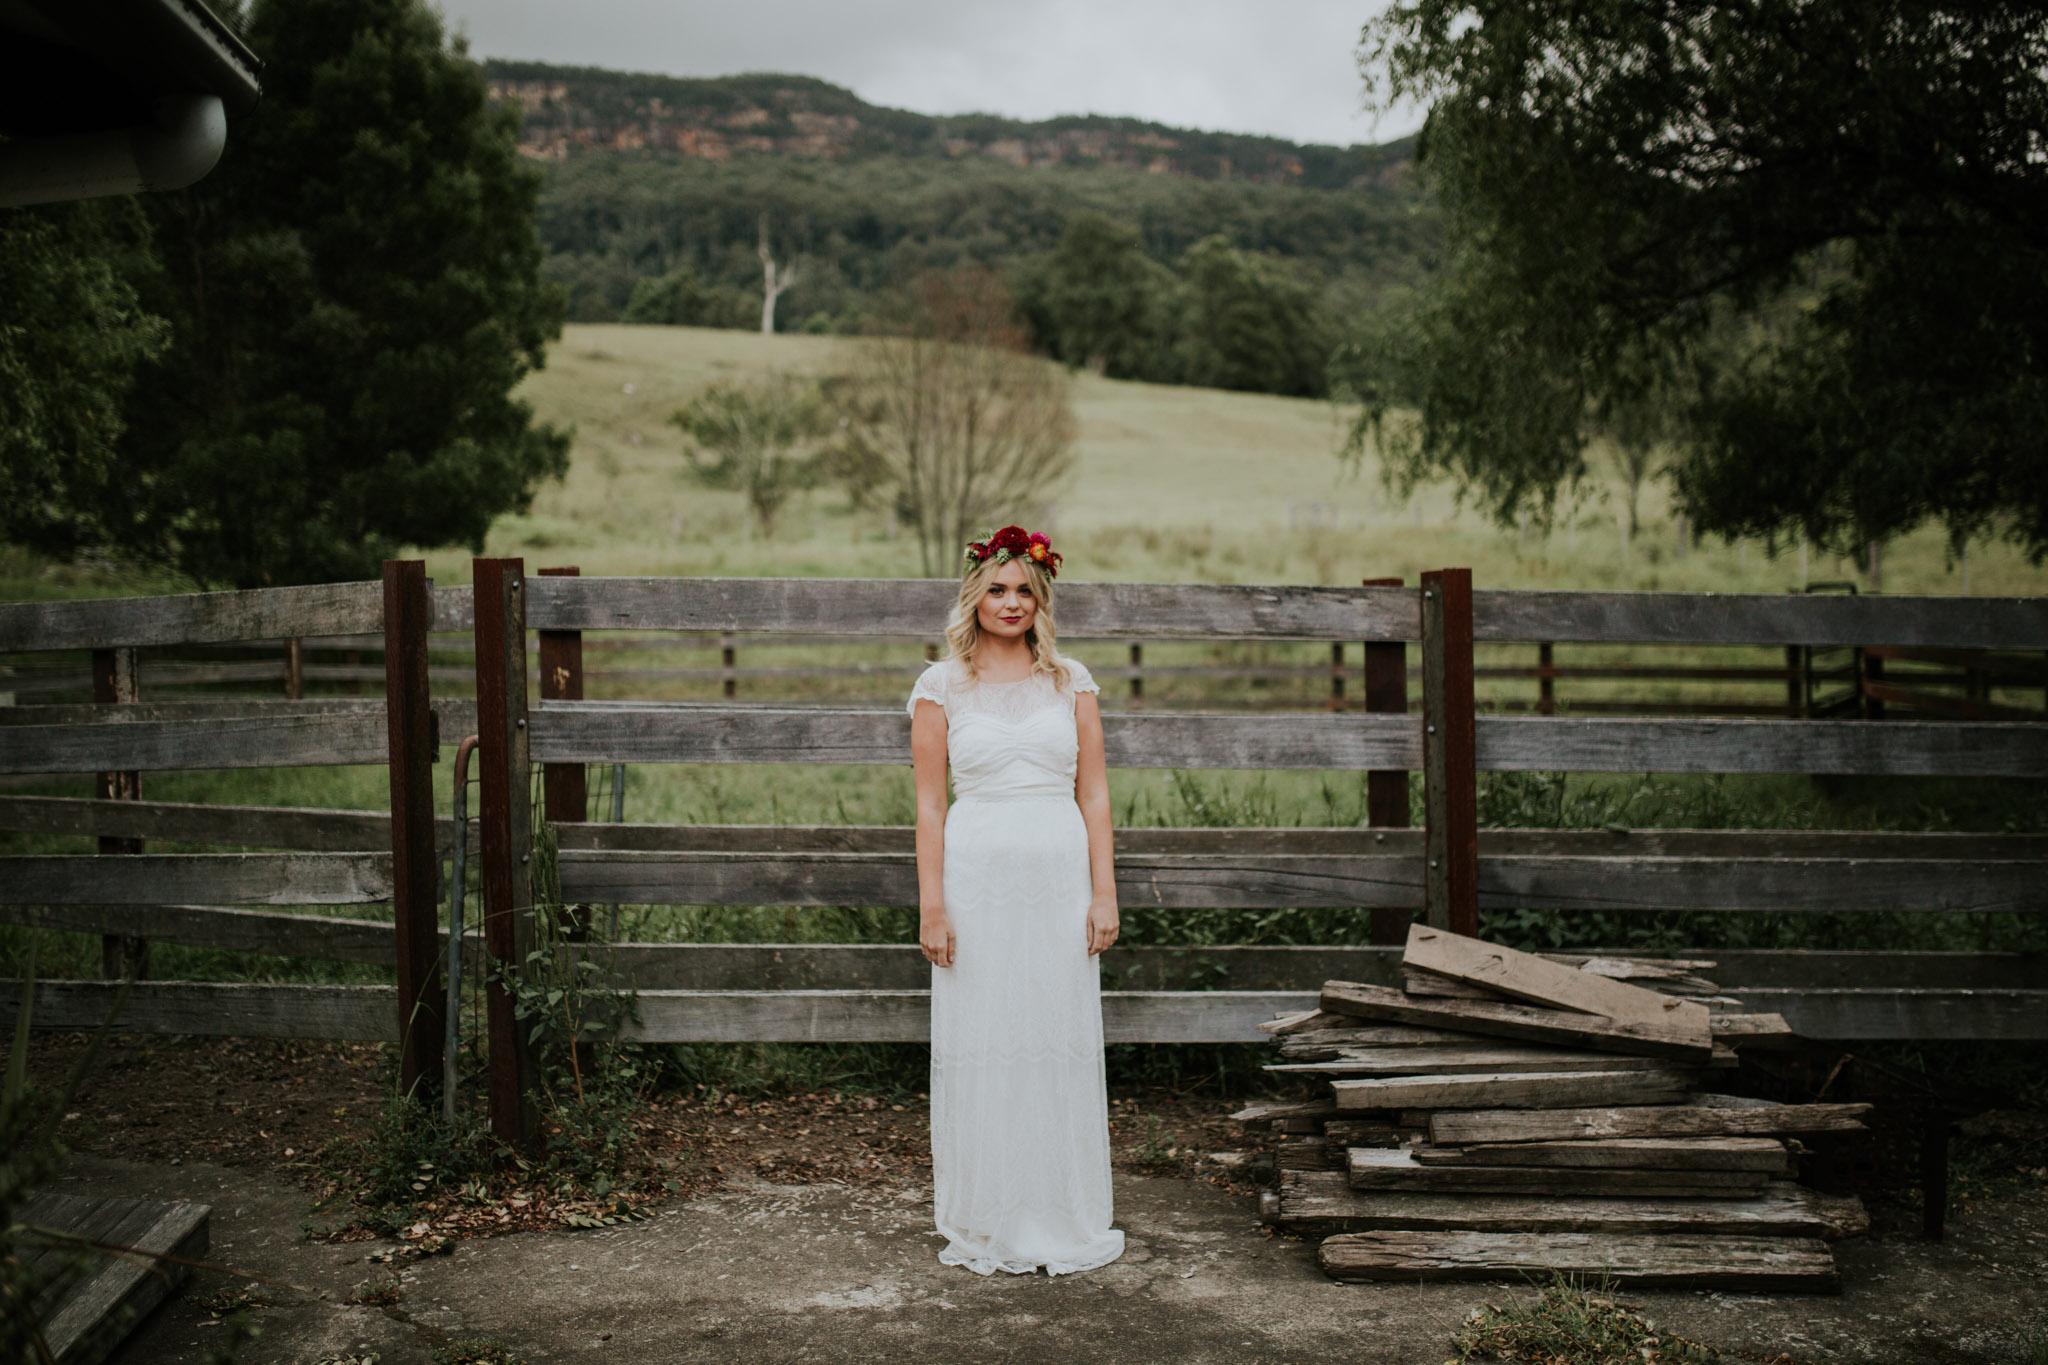 SPRING-GROVE-DAIRY-WEDDING-98.jpg